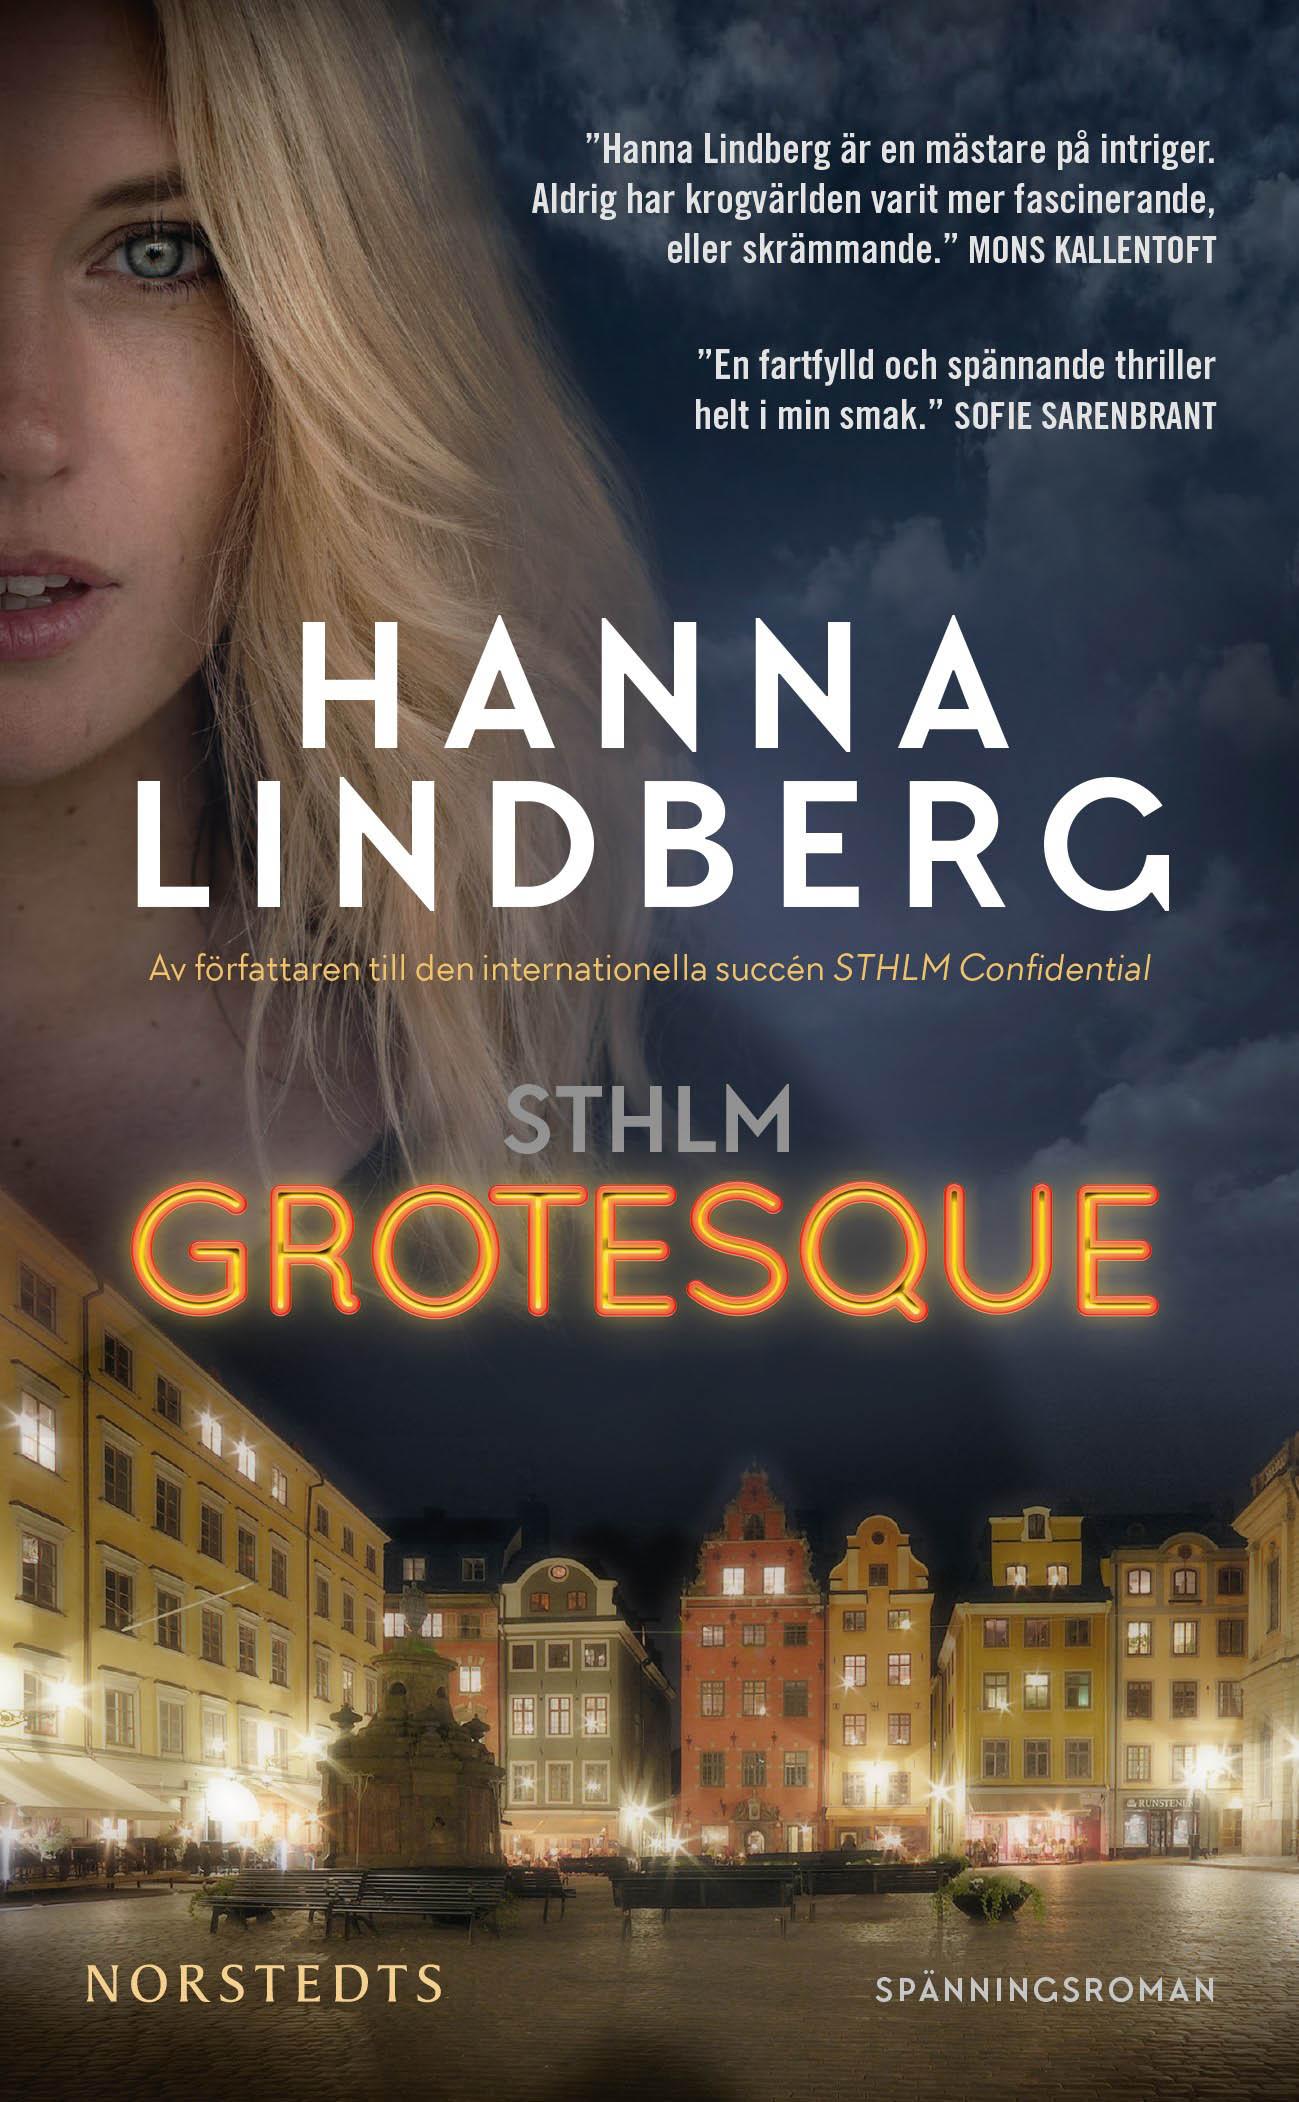 STHLM Grotesque paperback